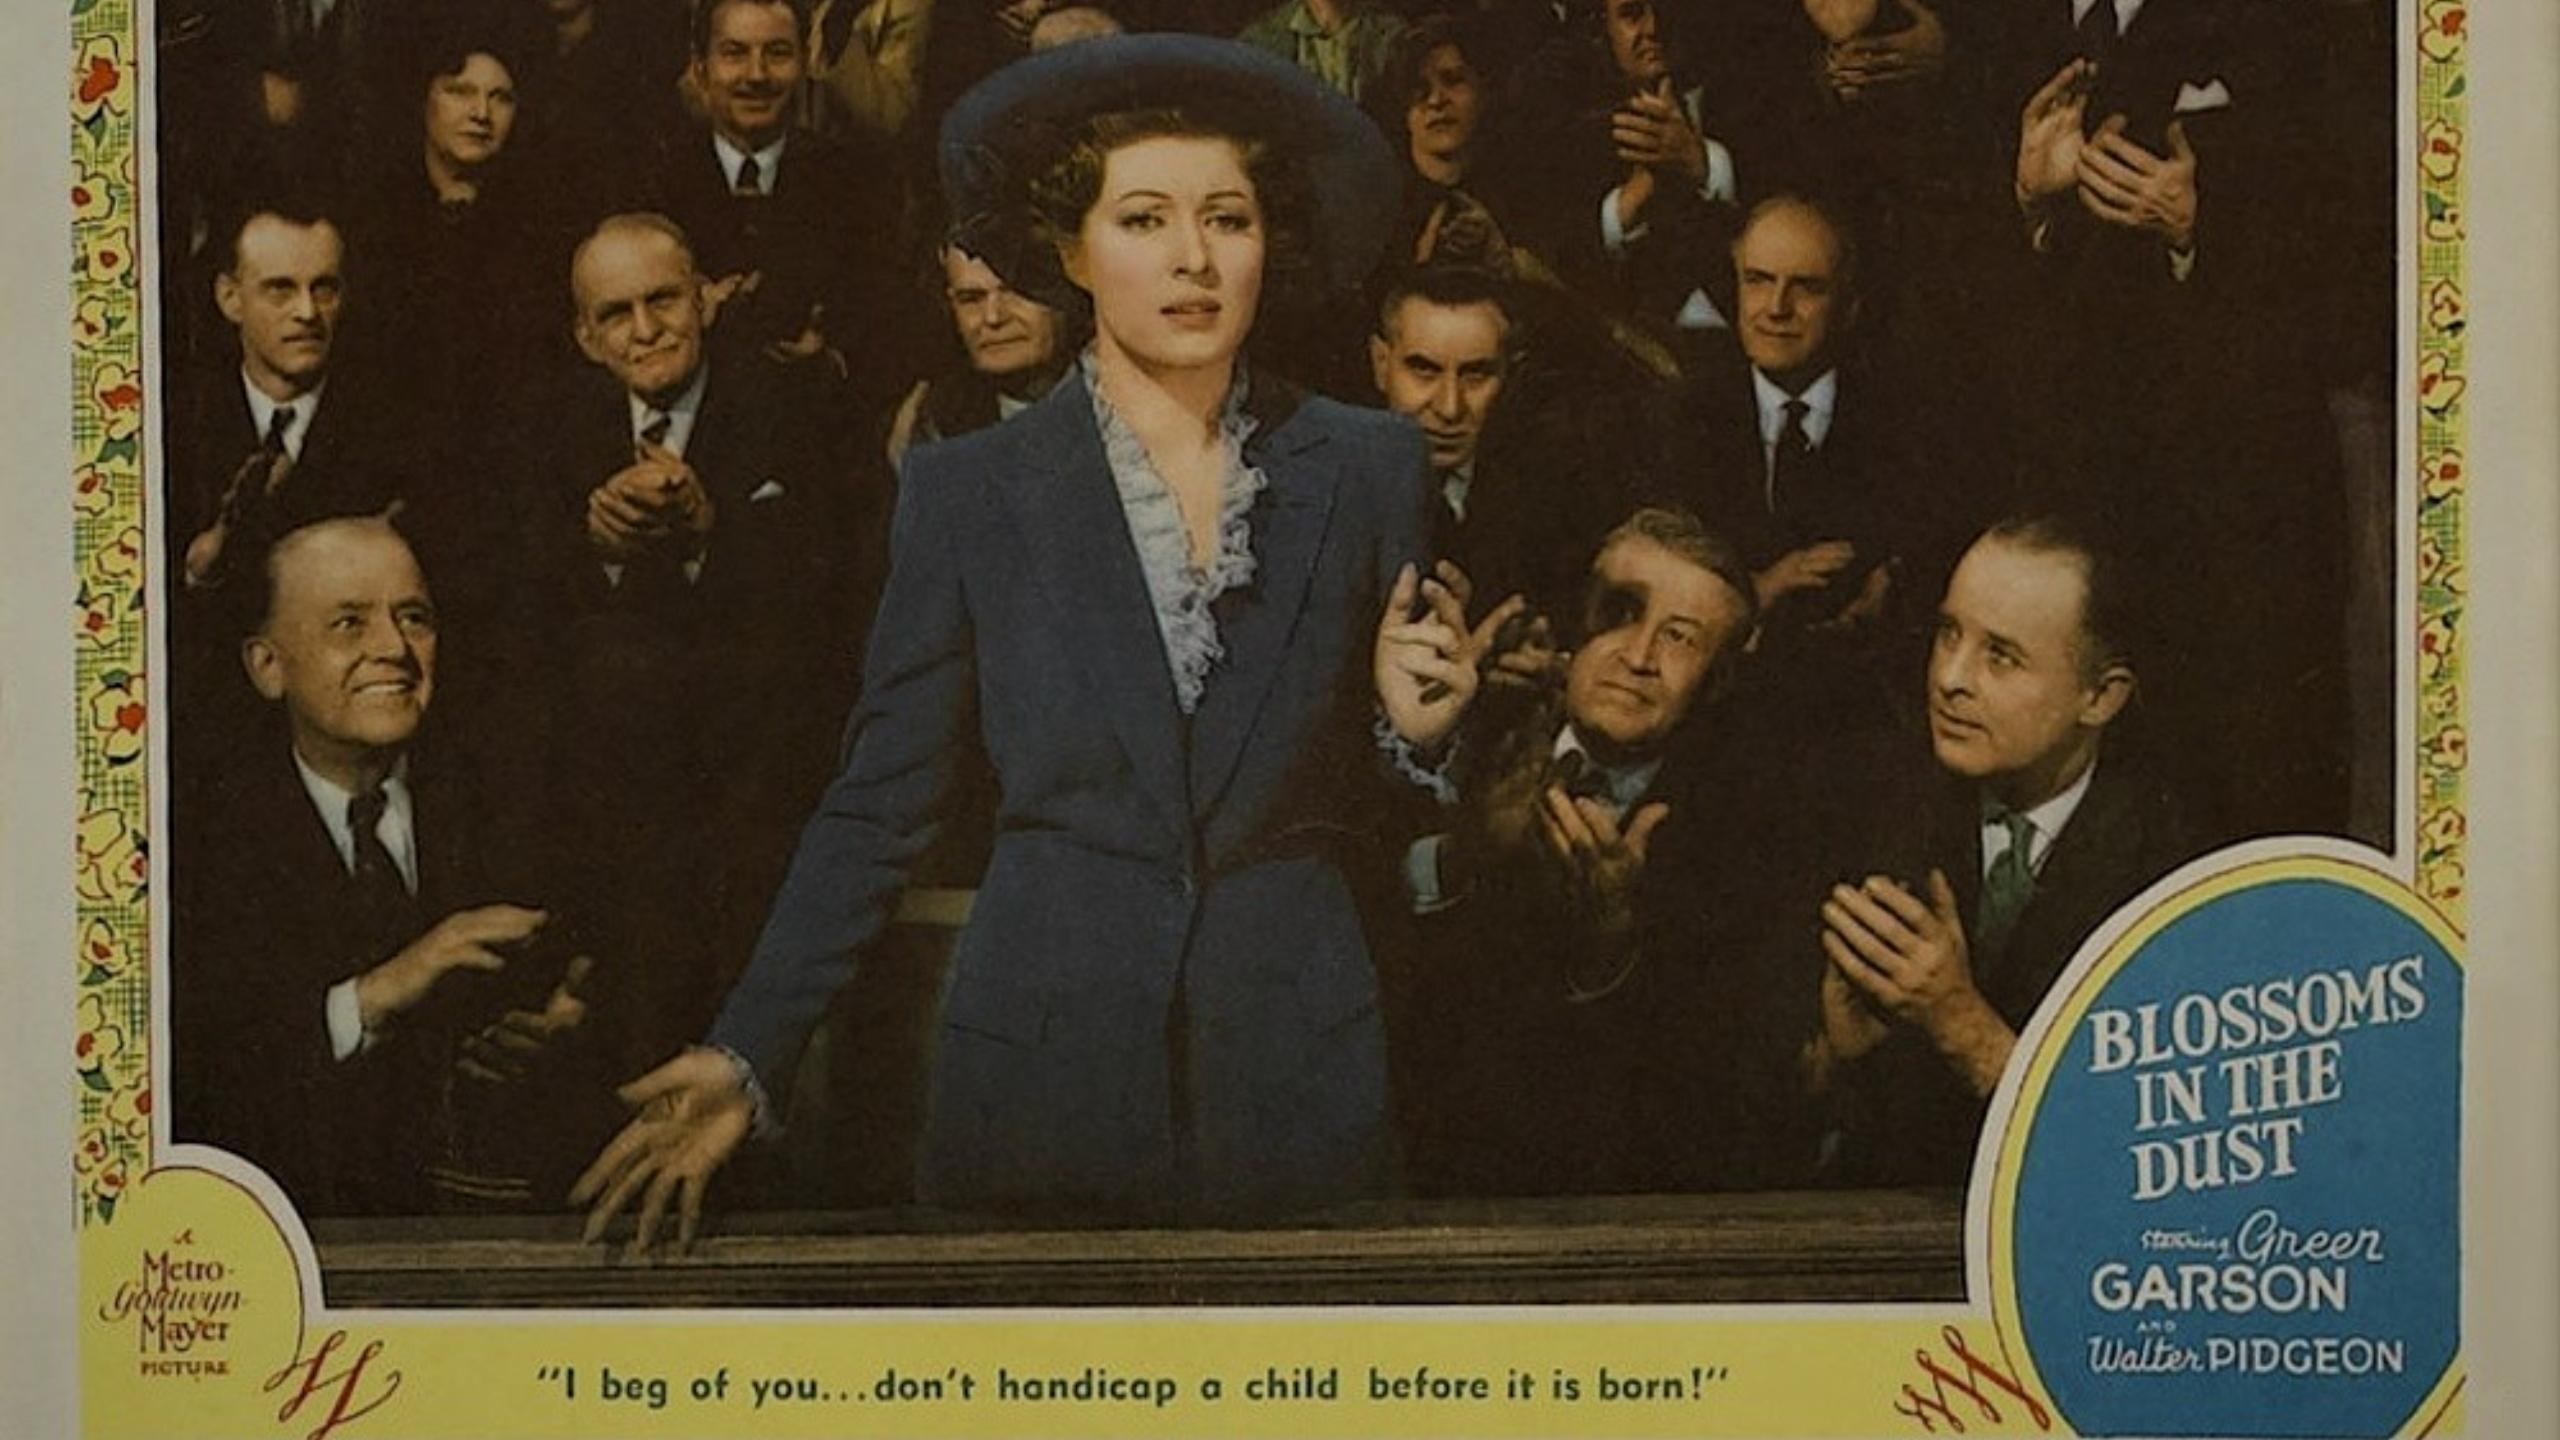 Impassioned Speeches: Edna Gladney and Meryl Streep